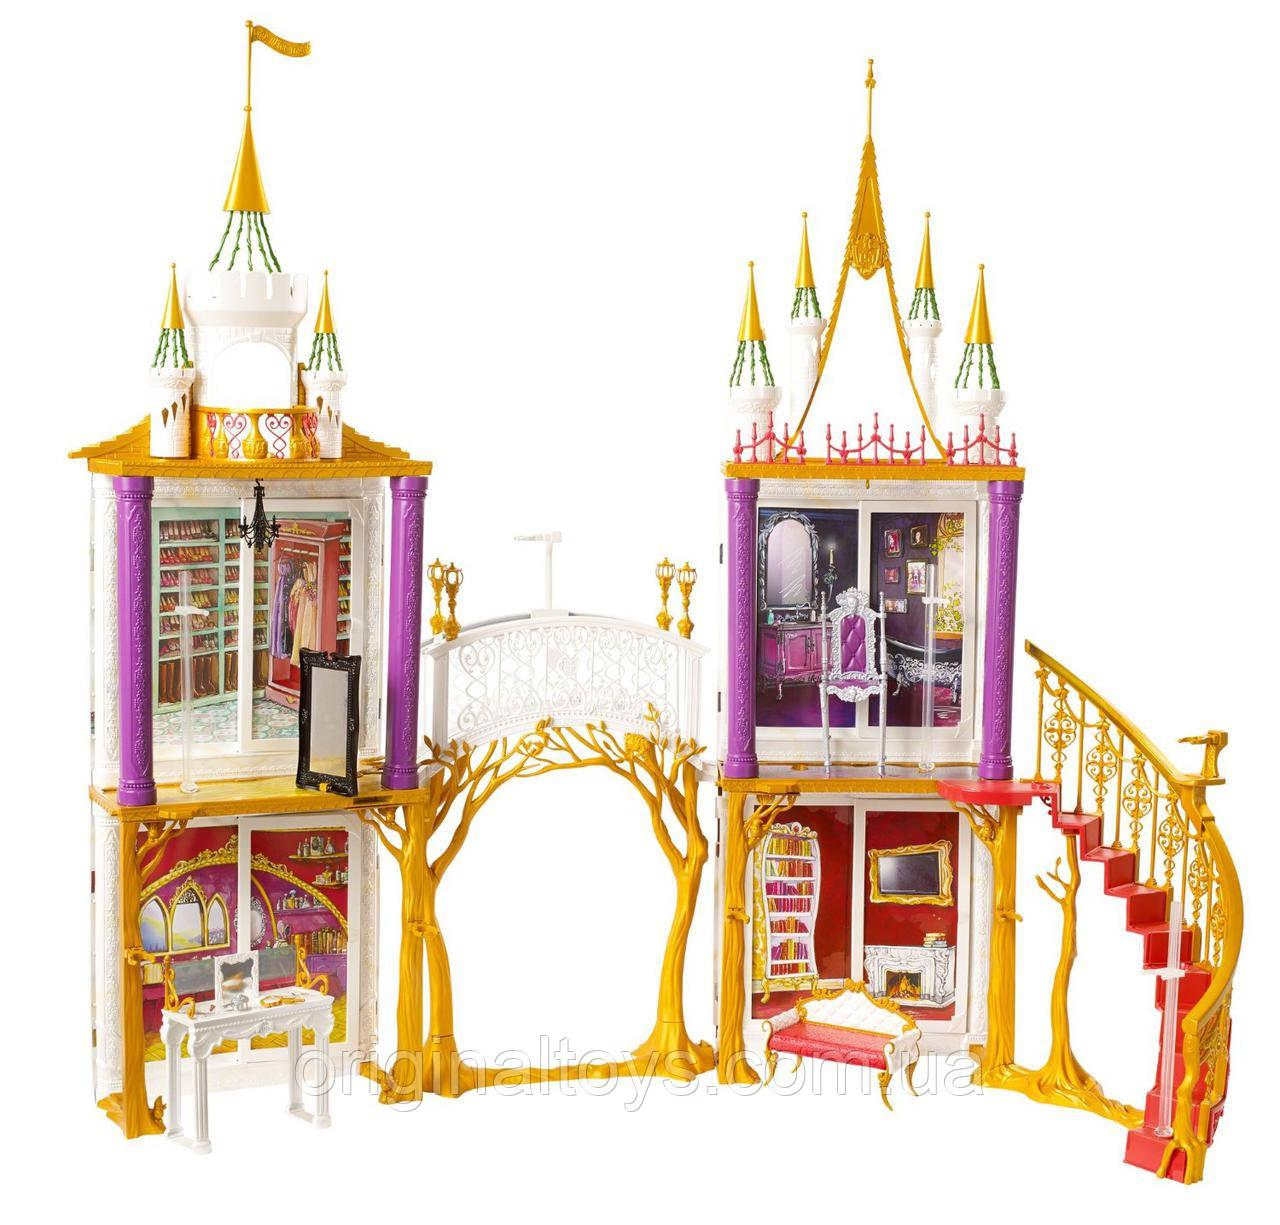 Игровой набор Замок Ever After High 2-in-1 Castle DLB40